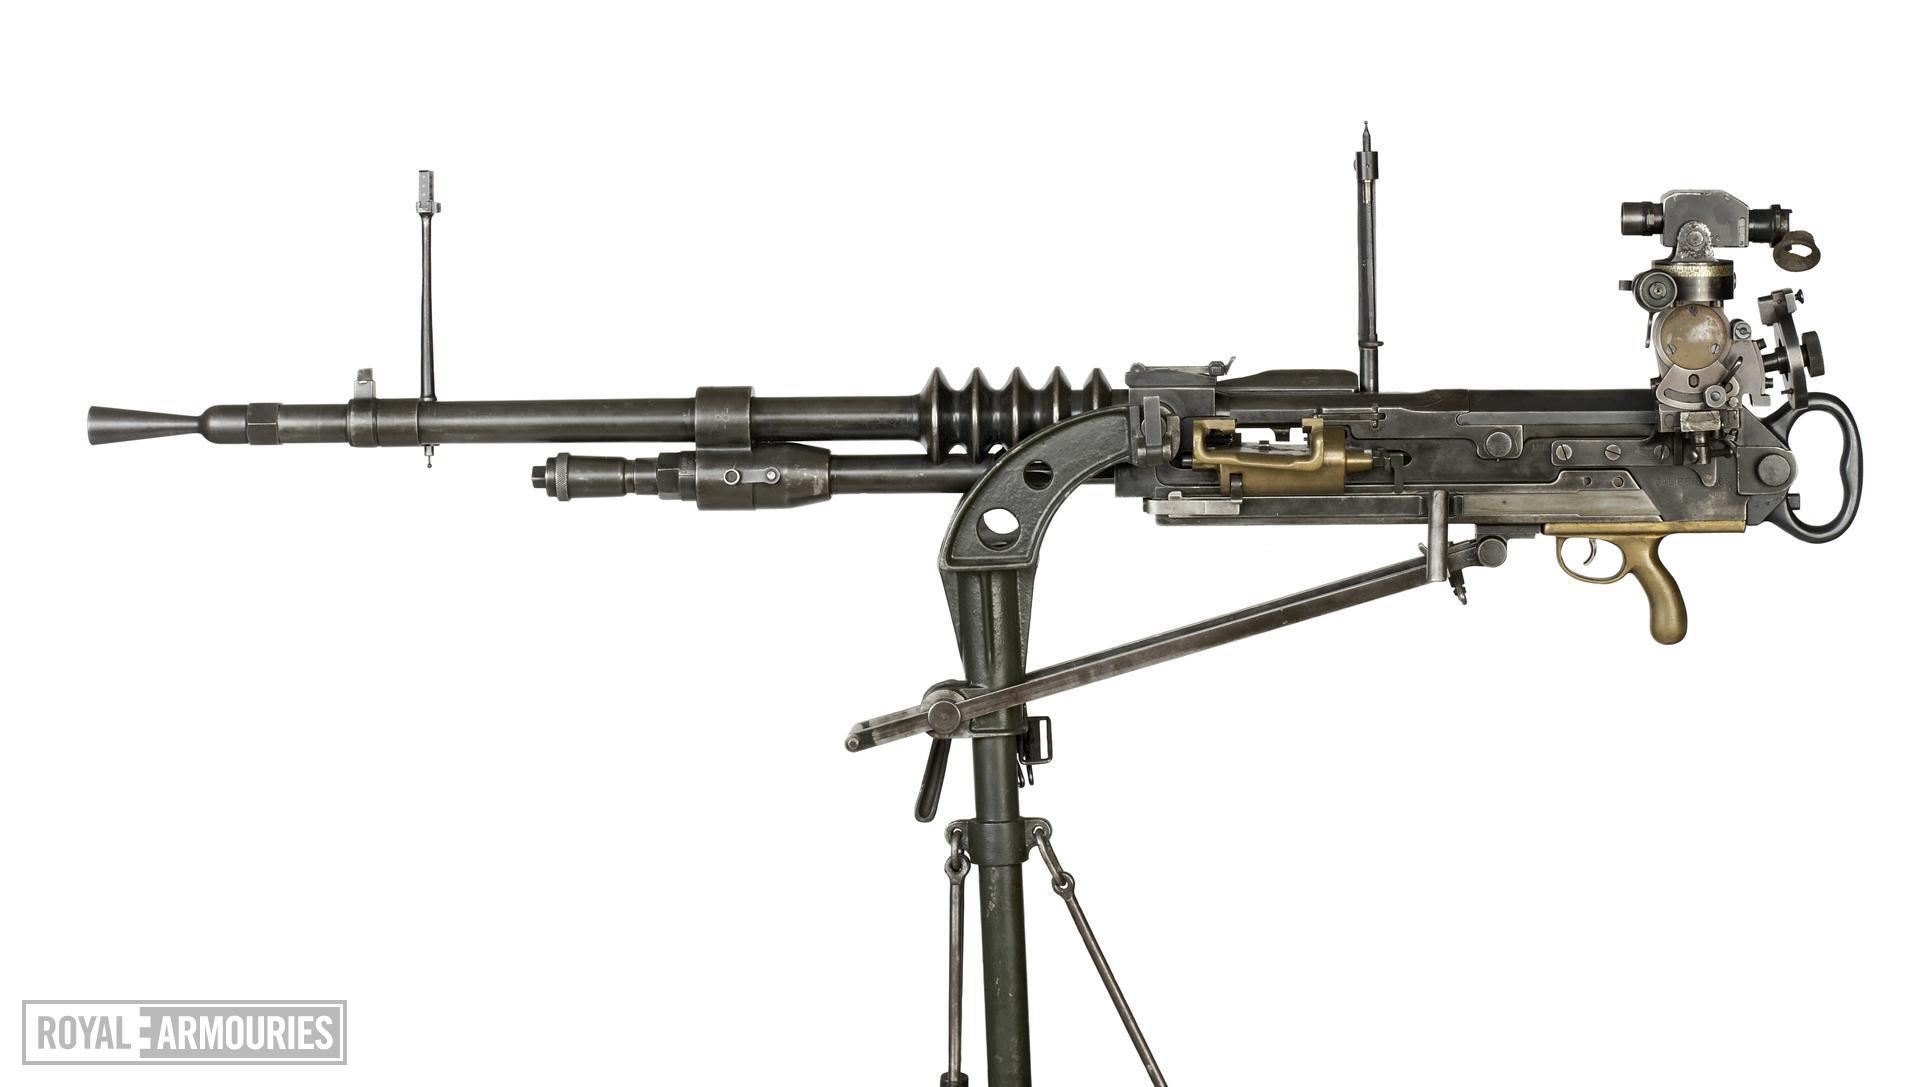 Hotchkiss gas operated machine gun, manufactured by FN, Liege, Belgium